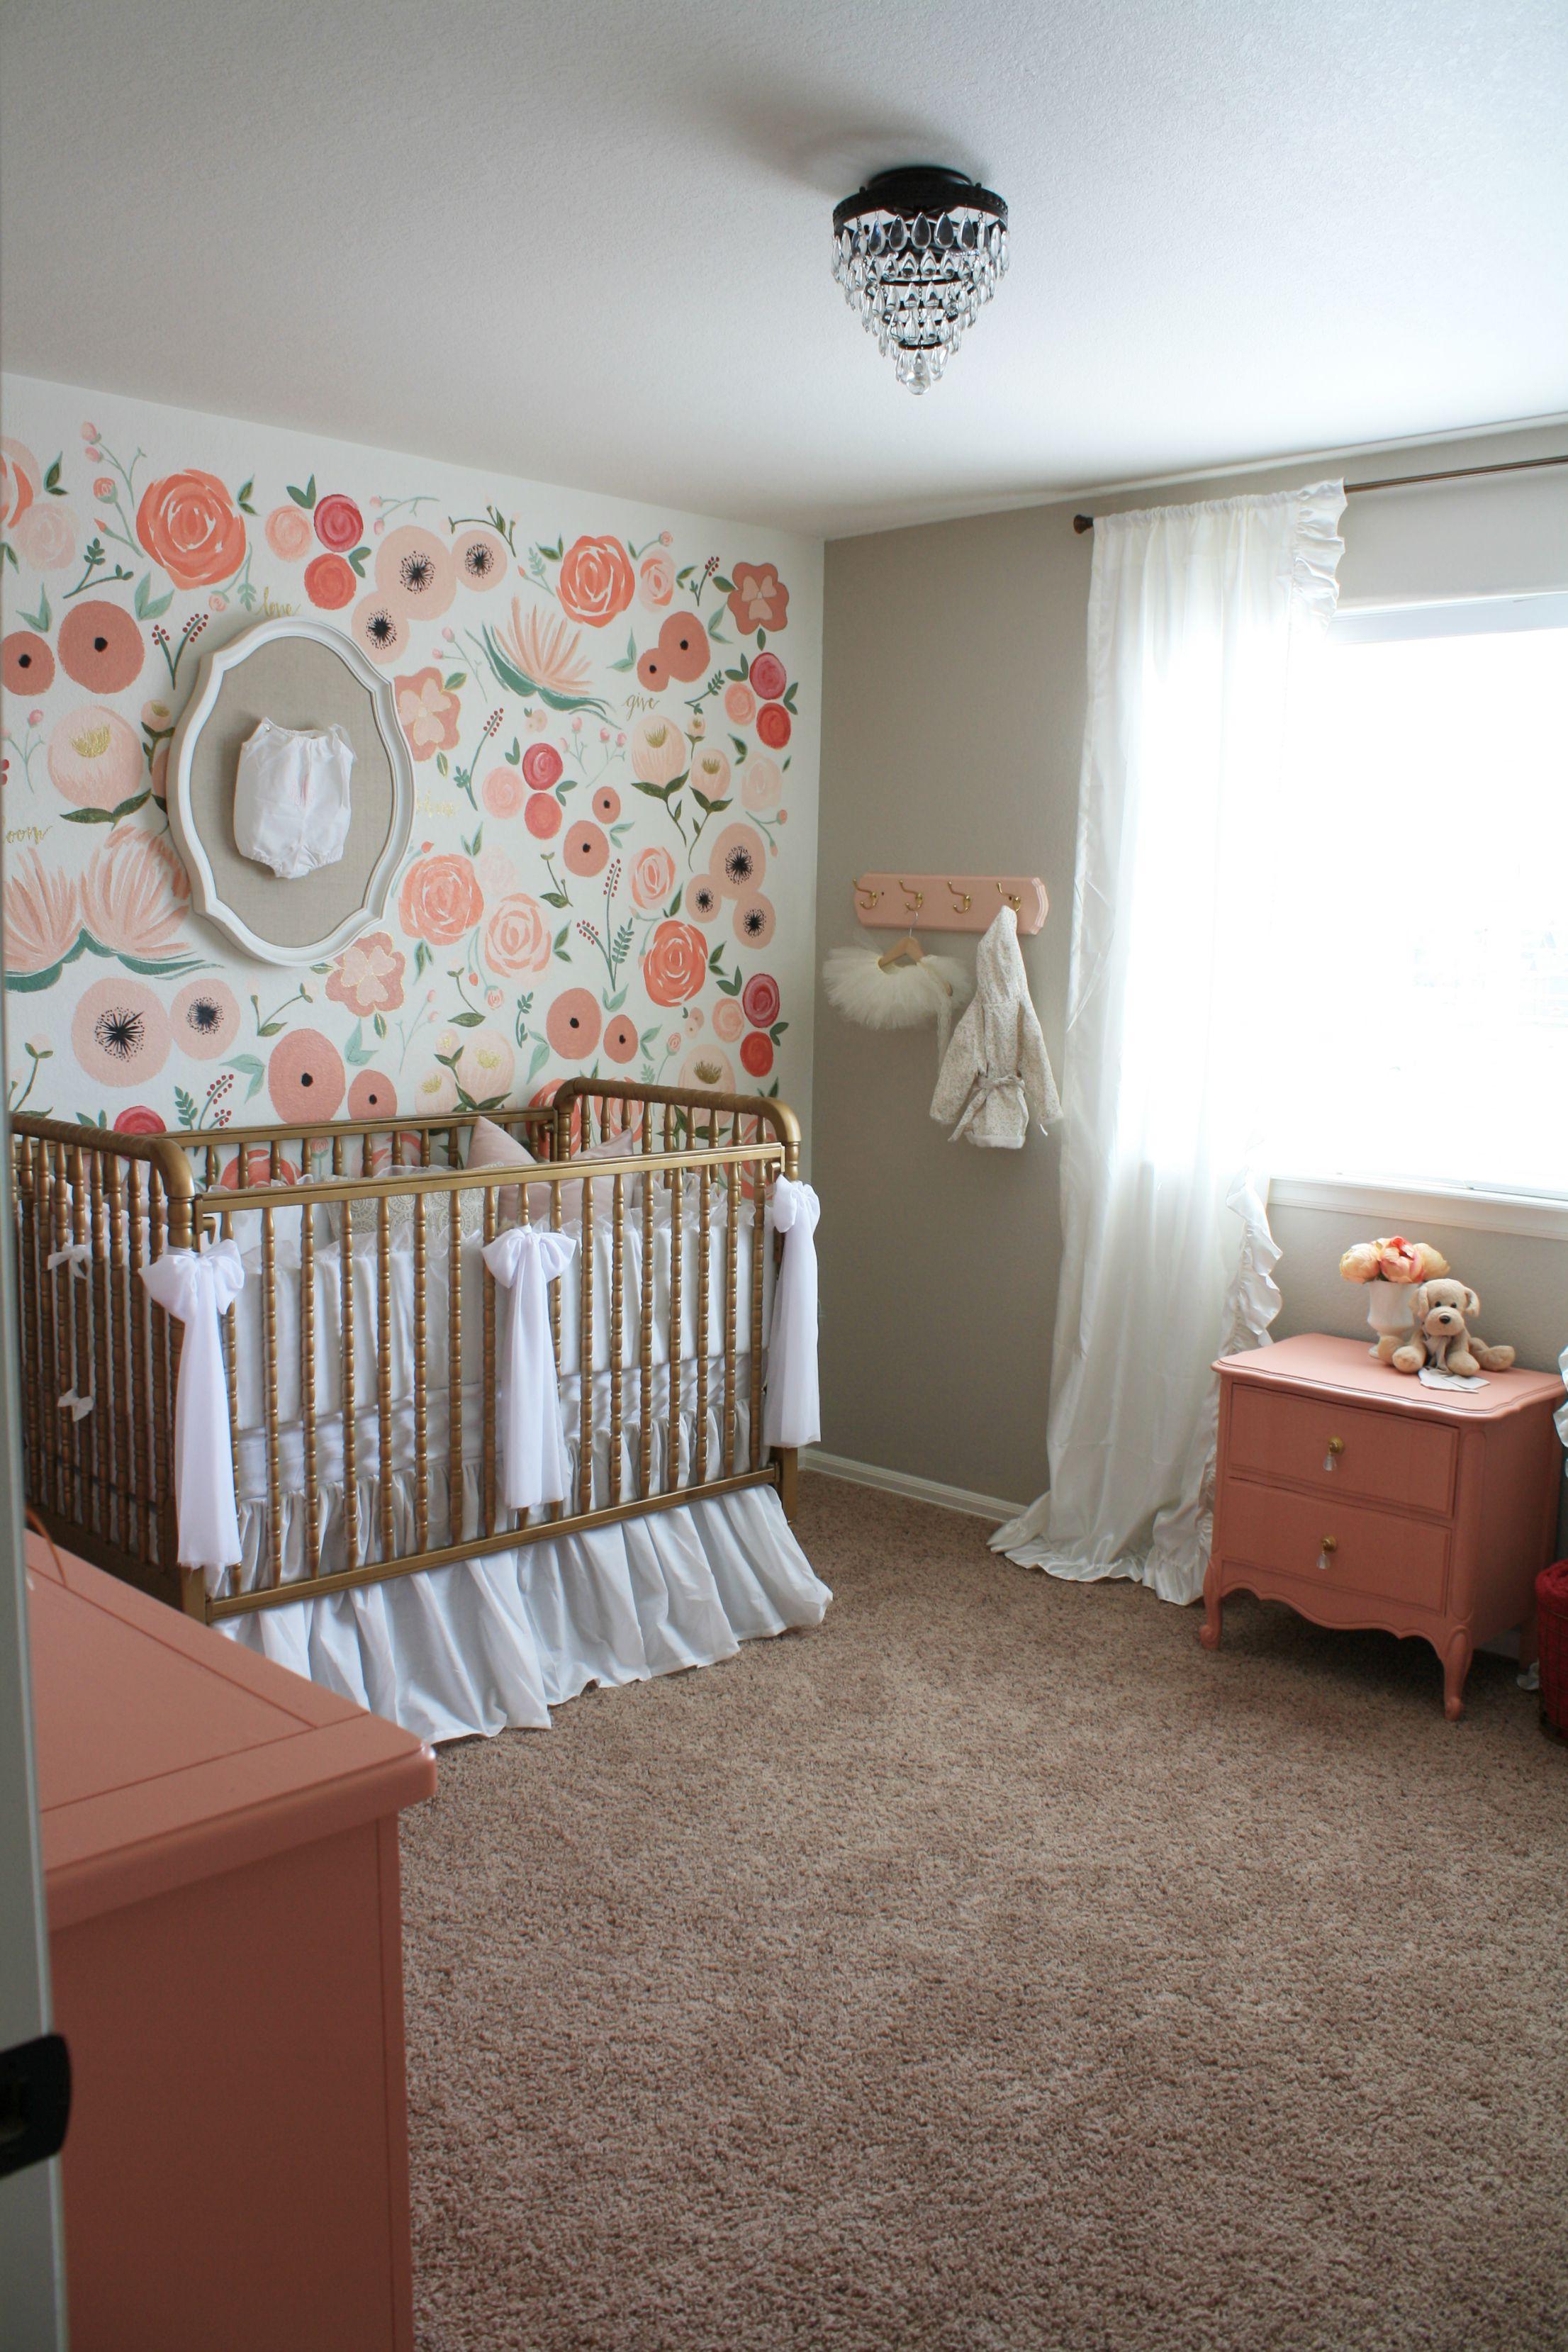 Hand Painted Floral Wall Mural Nursery Project Nursery